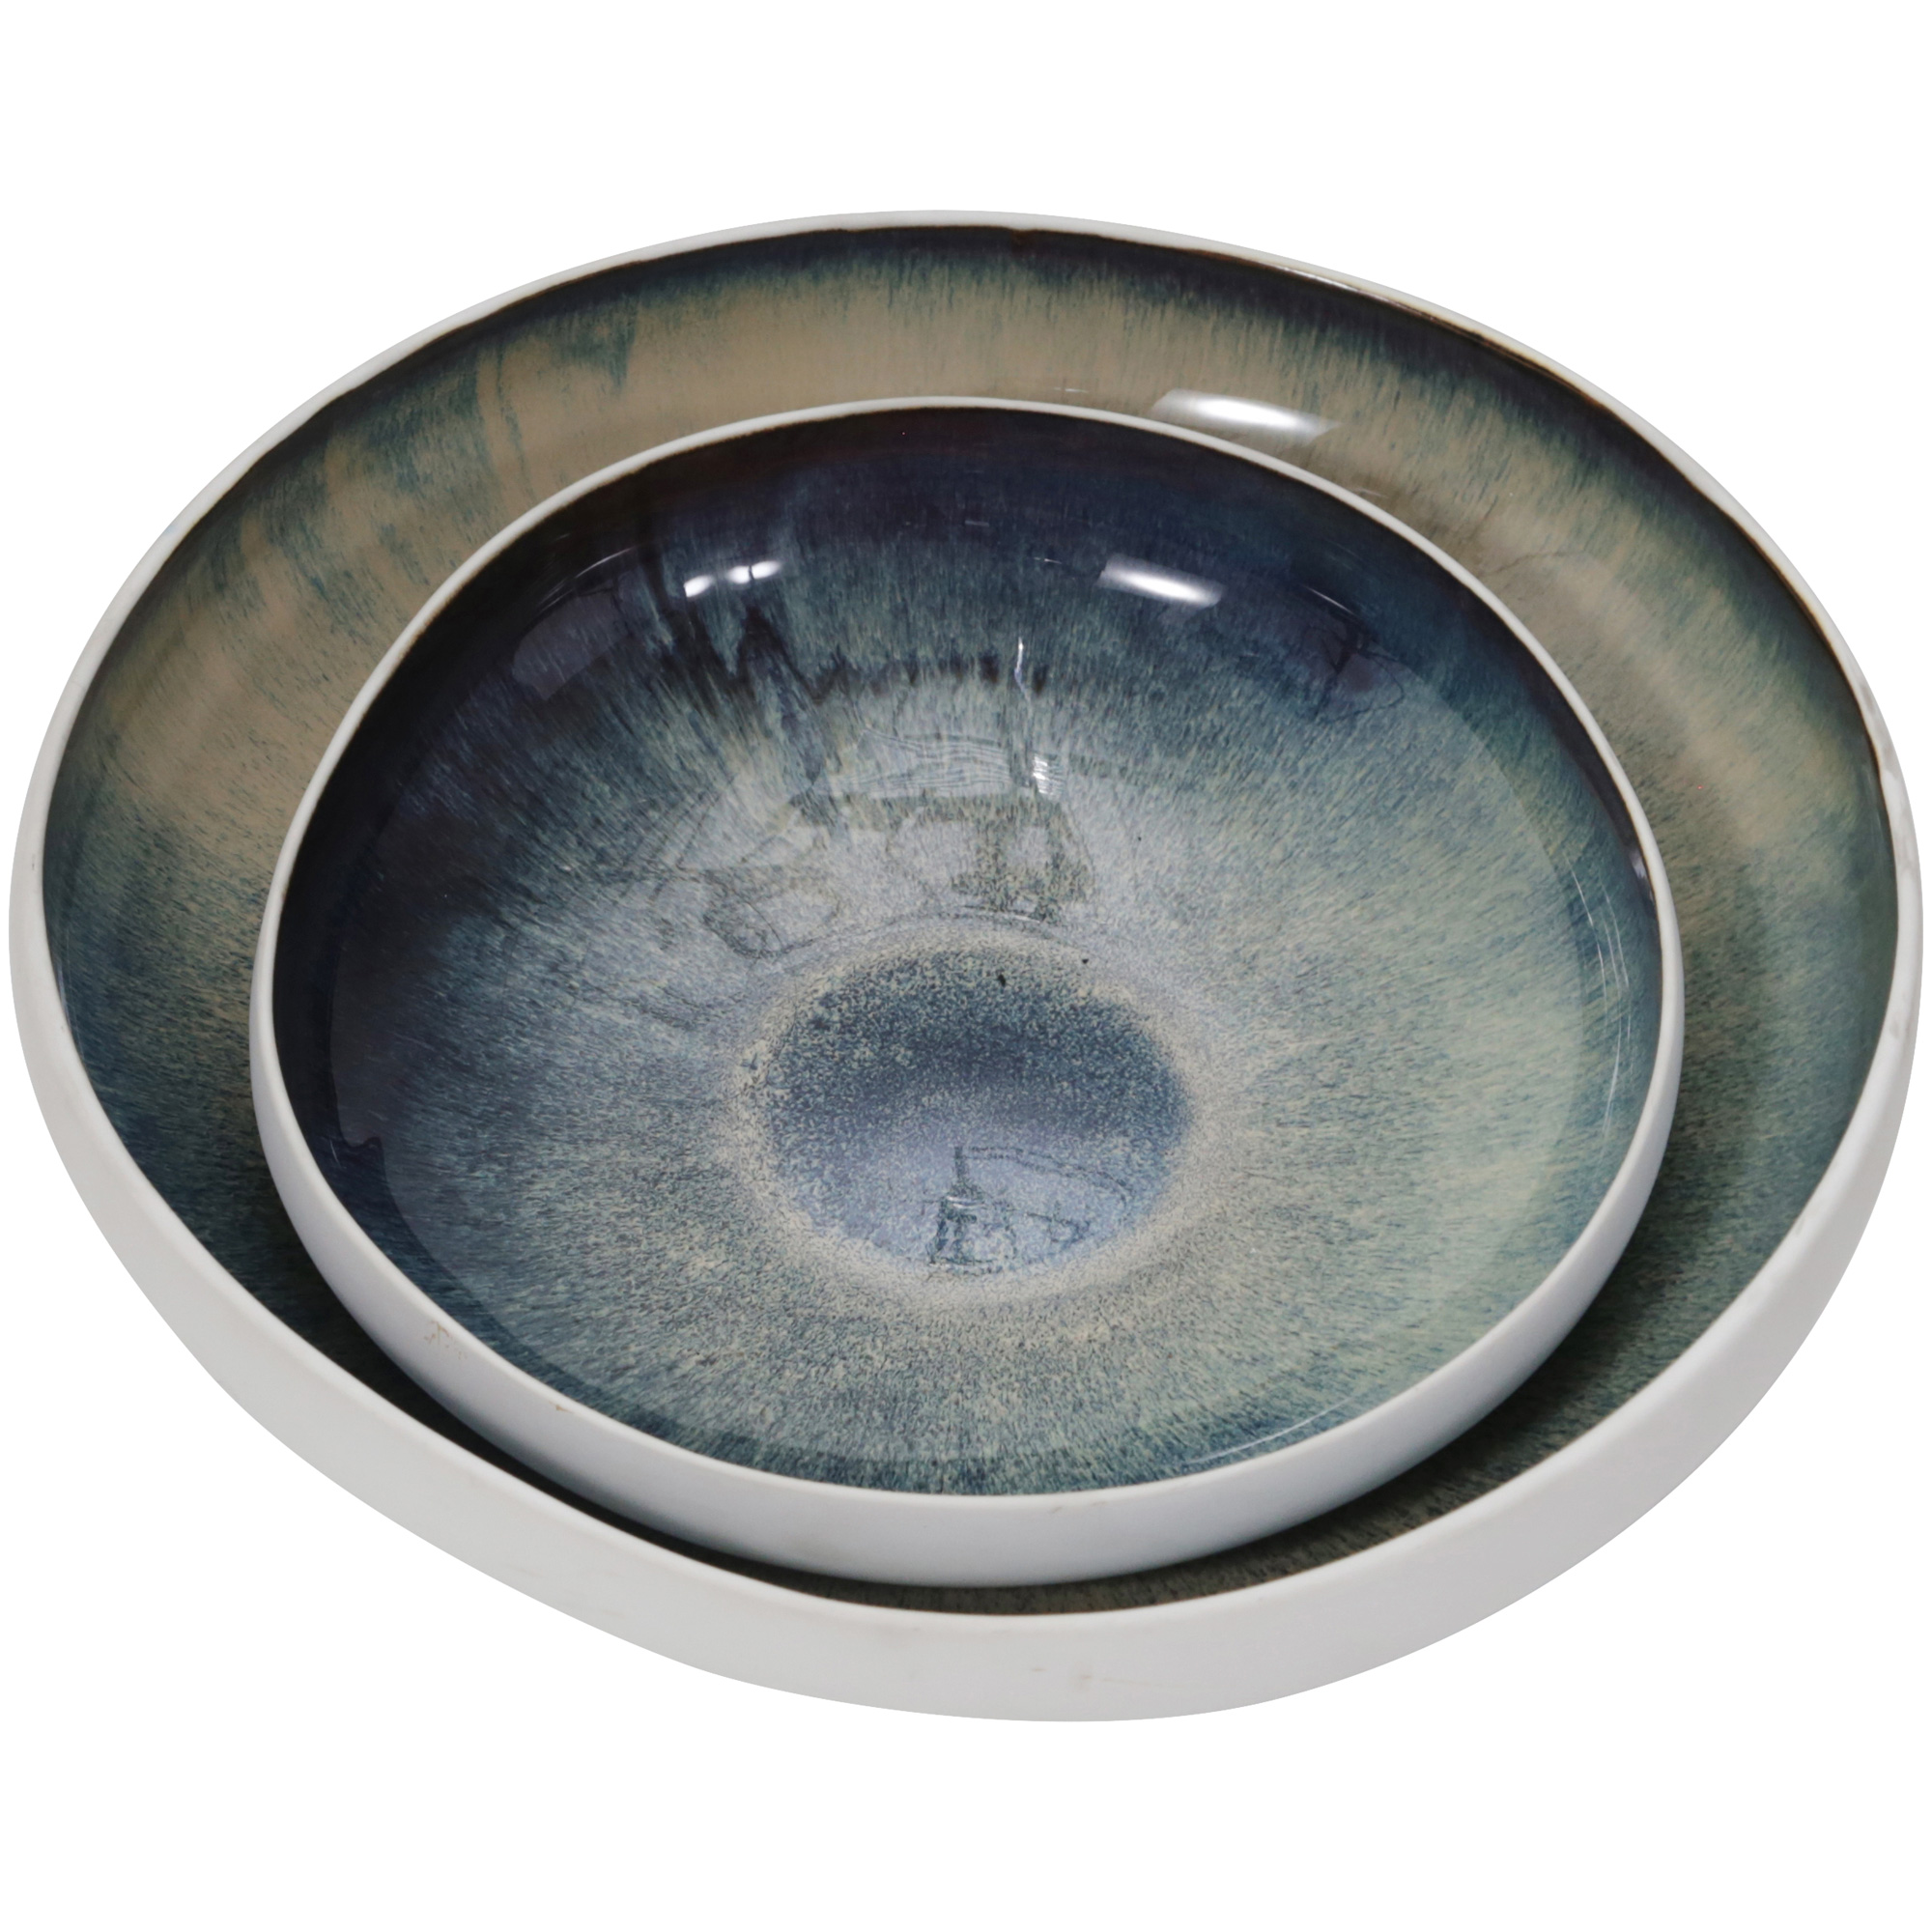 Sagebrook | Elevated Chic Green Ceramic Bowls